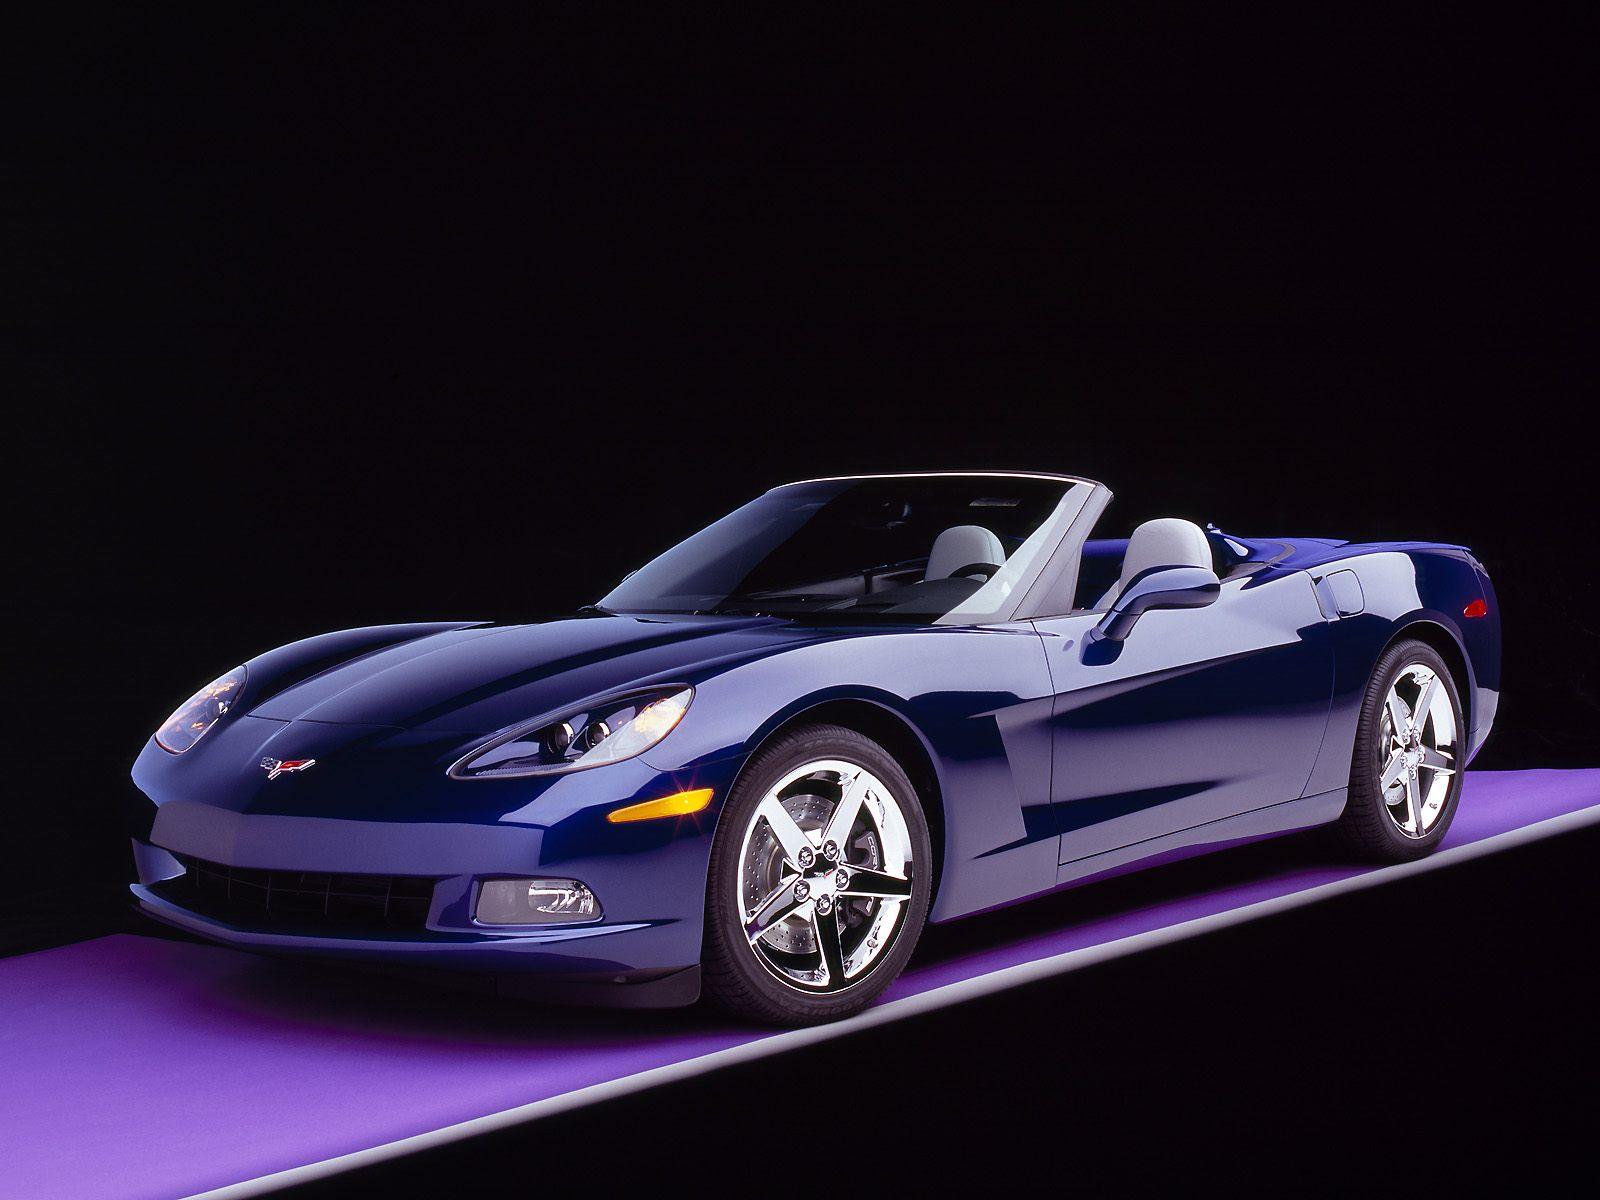 Desktop wallpaper downloads Chevrolet Corvette car   Huge 1600x1200